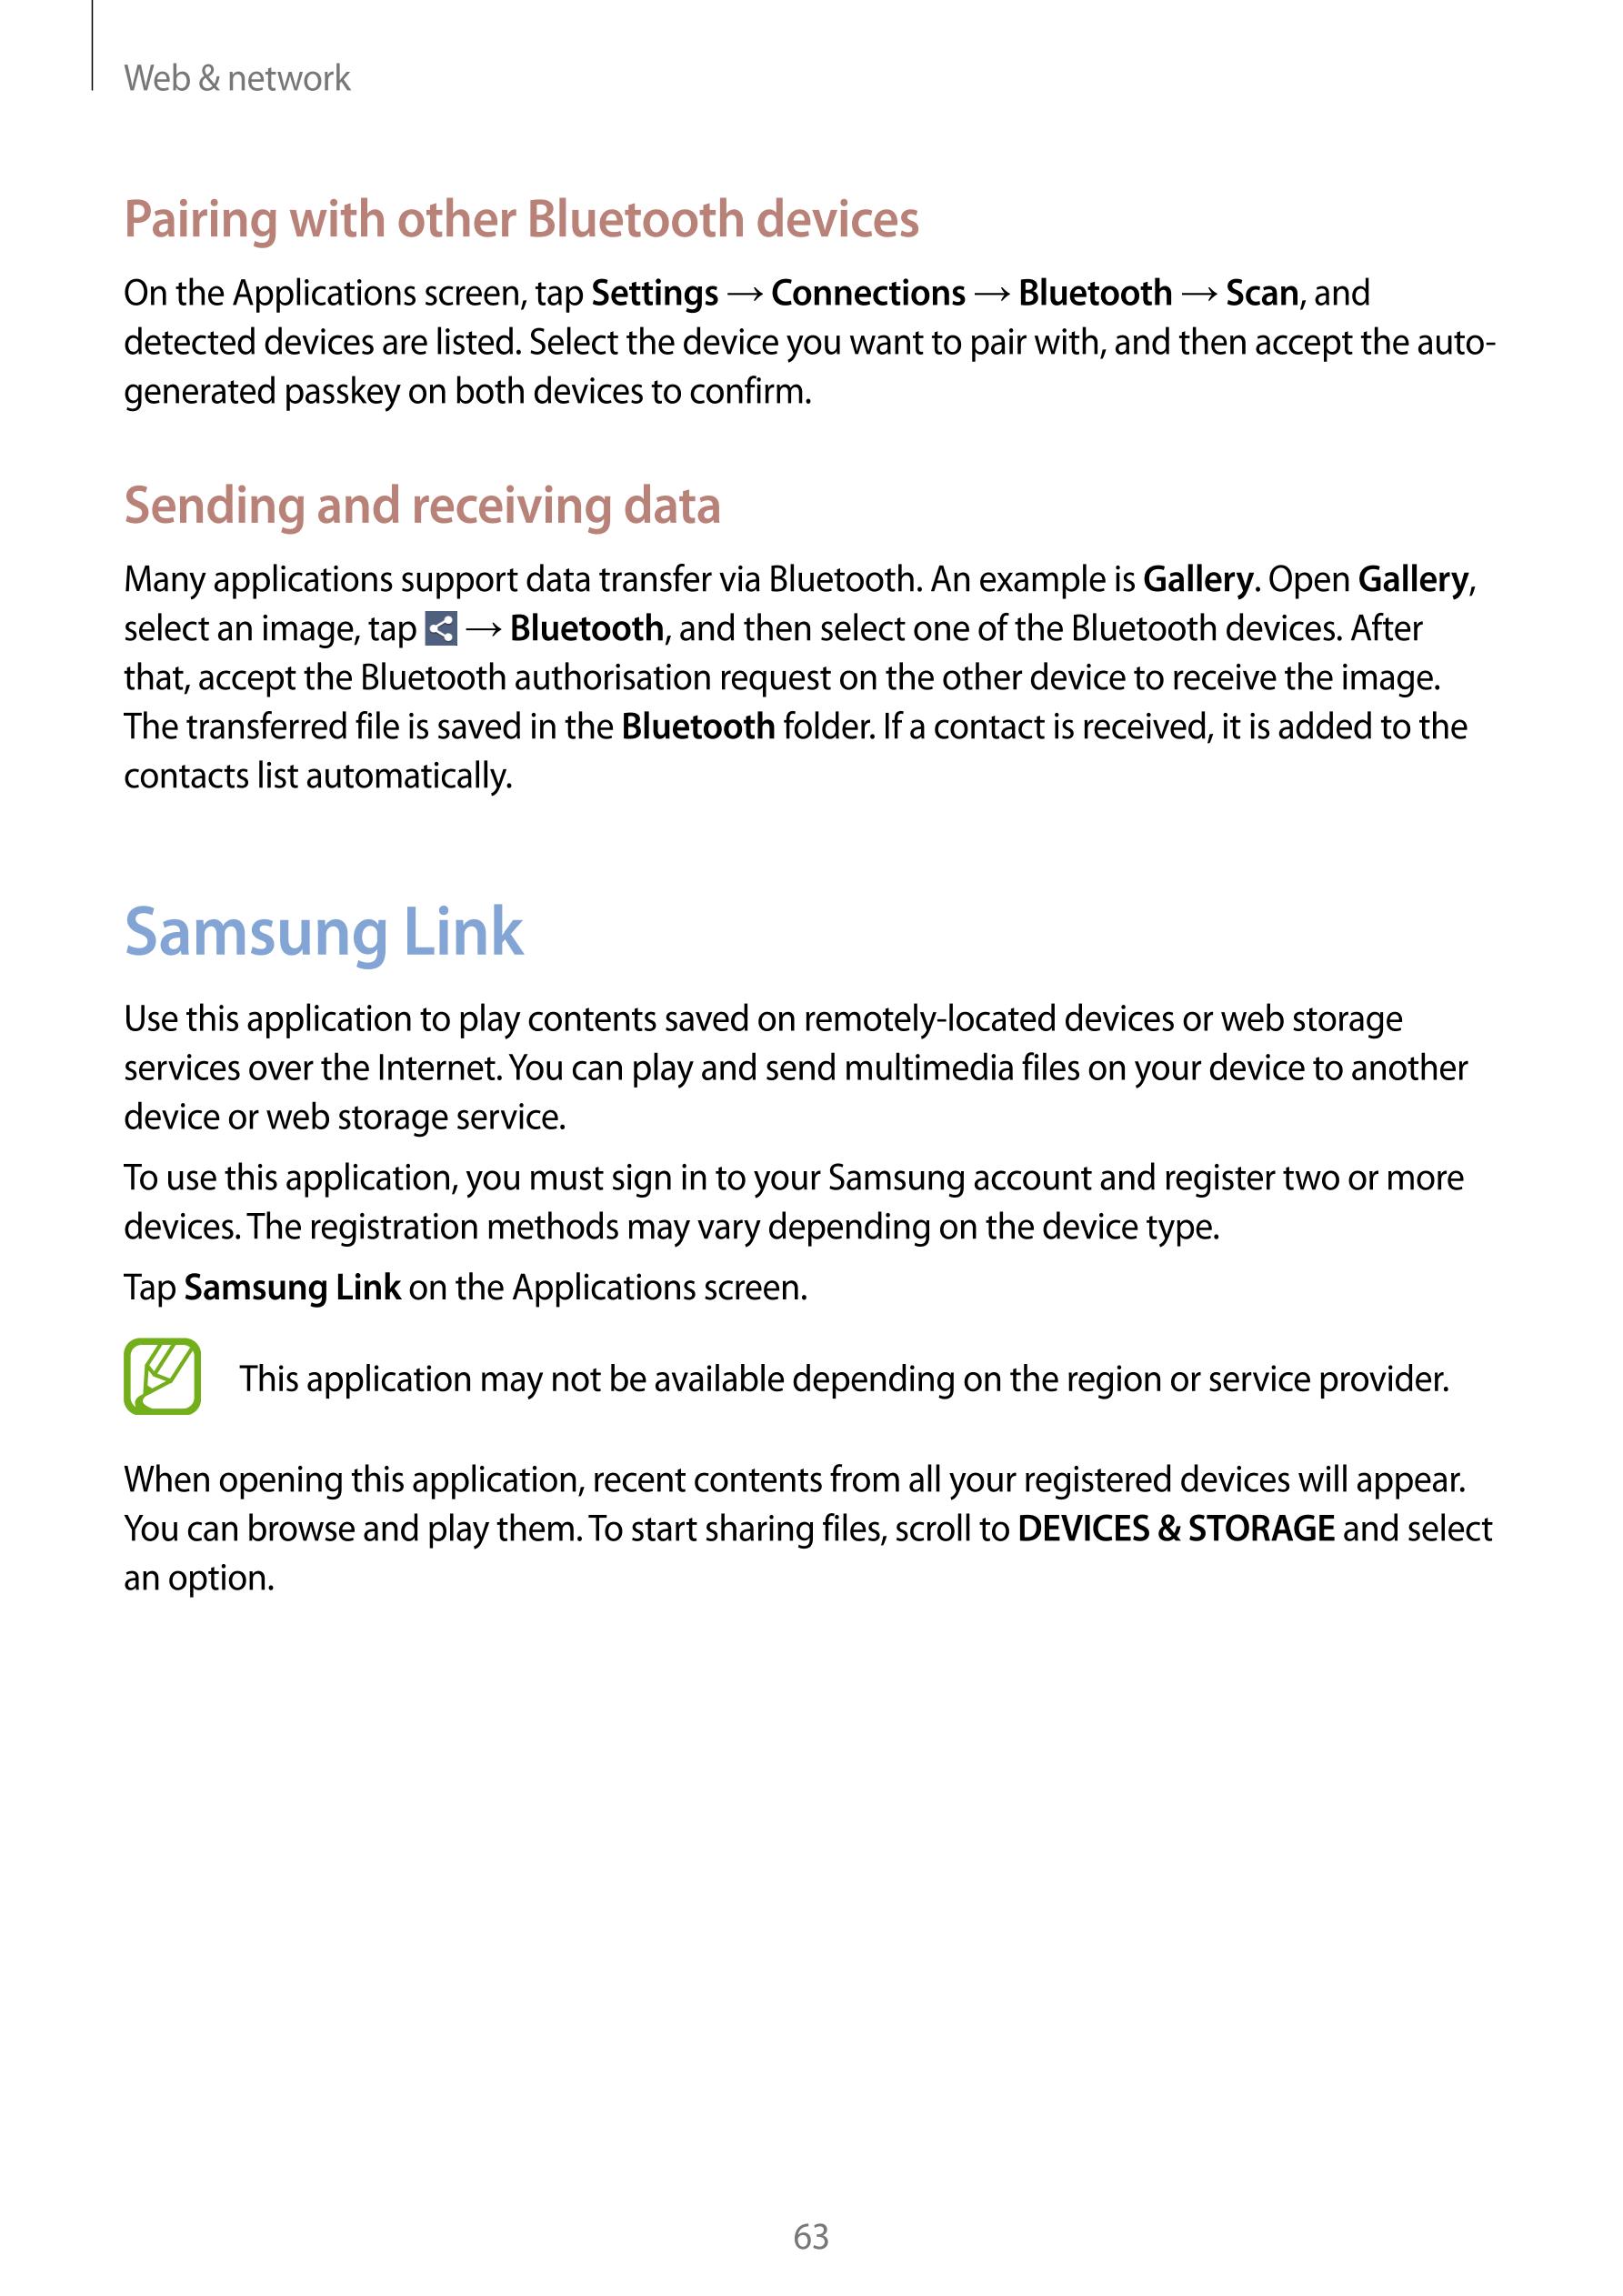 Manual - Samsung Galaxy Grand Neo - Android 4 2 - Smart Guides